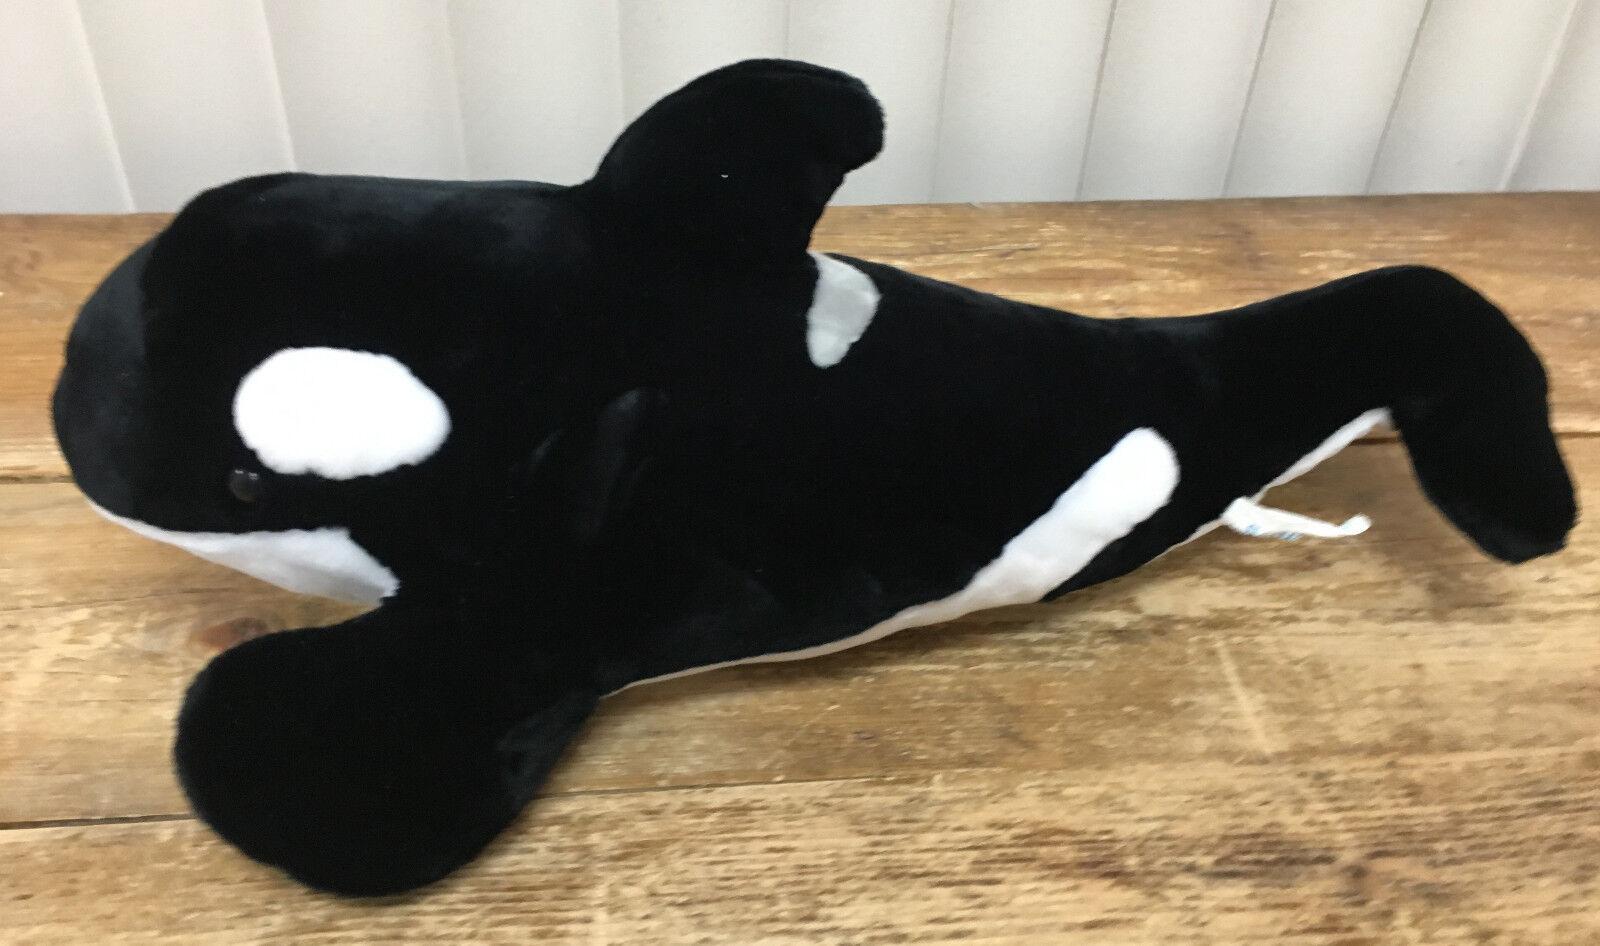 Seaworld Sea World Peluche Nero Bianco Balena Orca Peluche Peluche 20